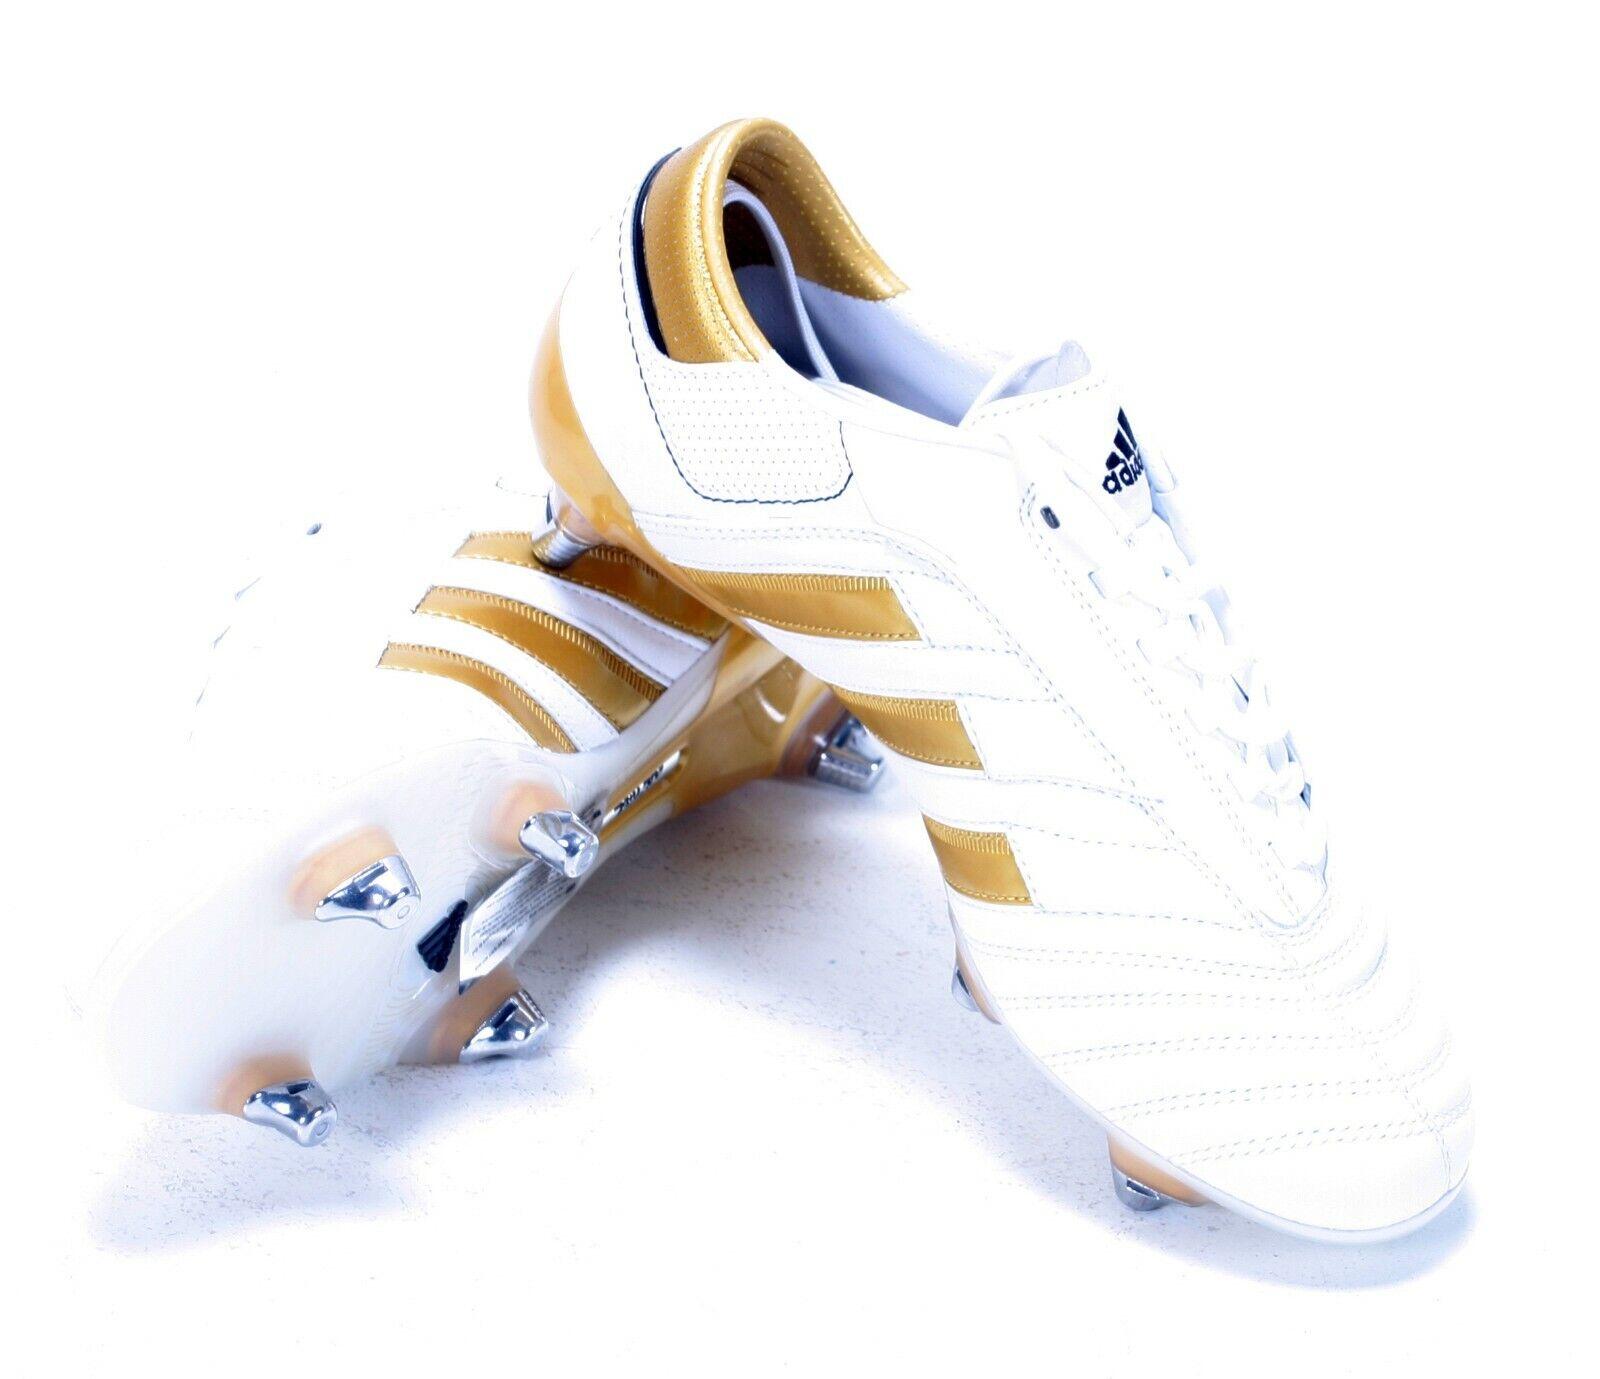 Adidas Adipure III XTRX botas De Fútbol Hombres blancoo goild bninb G120796 EU39